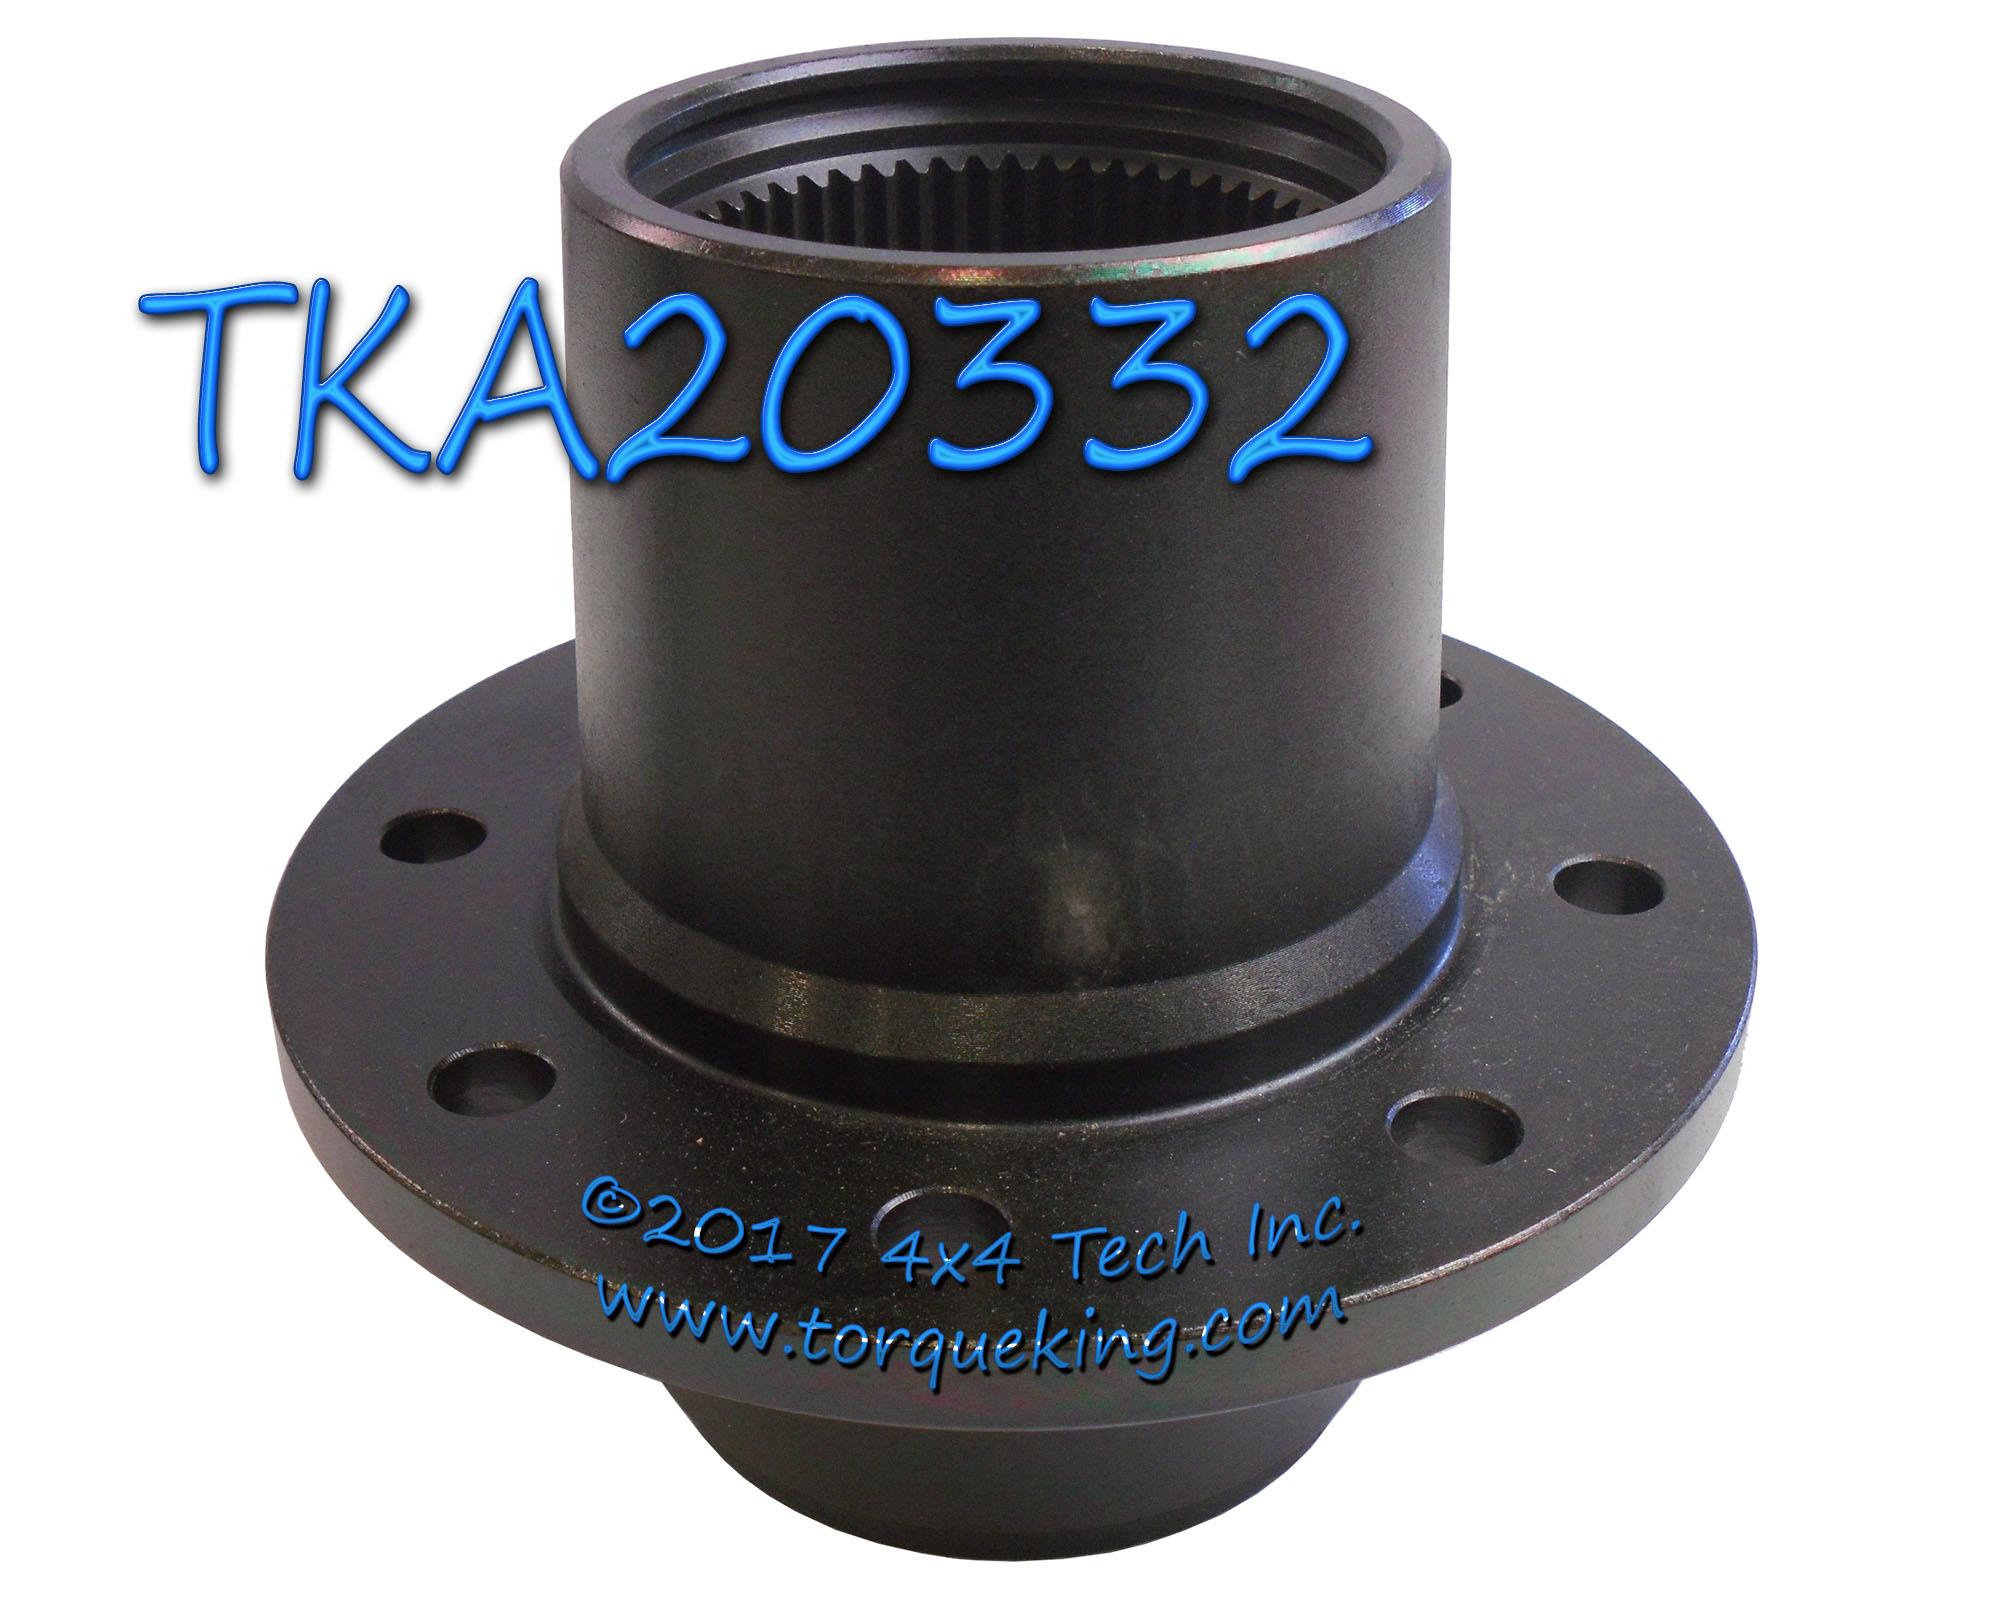 qu20332 - Torque King 4x4